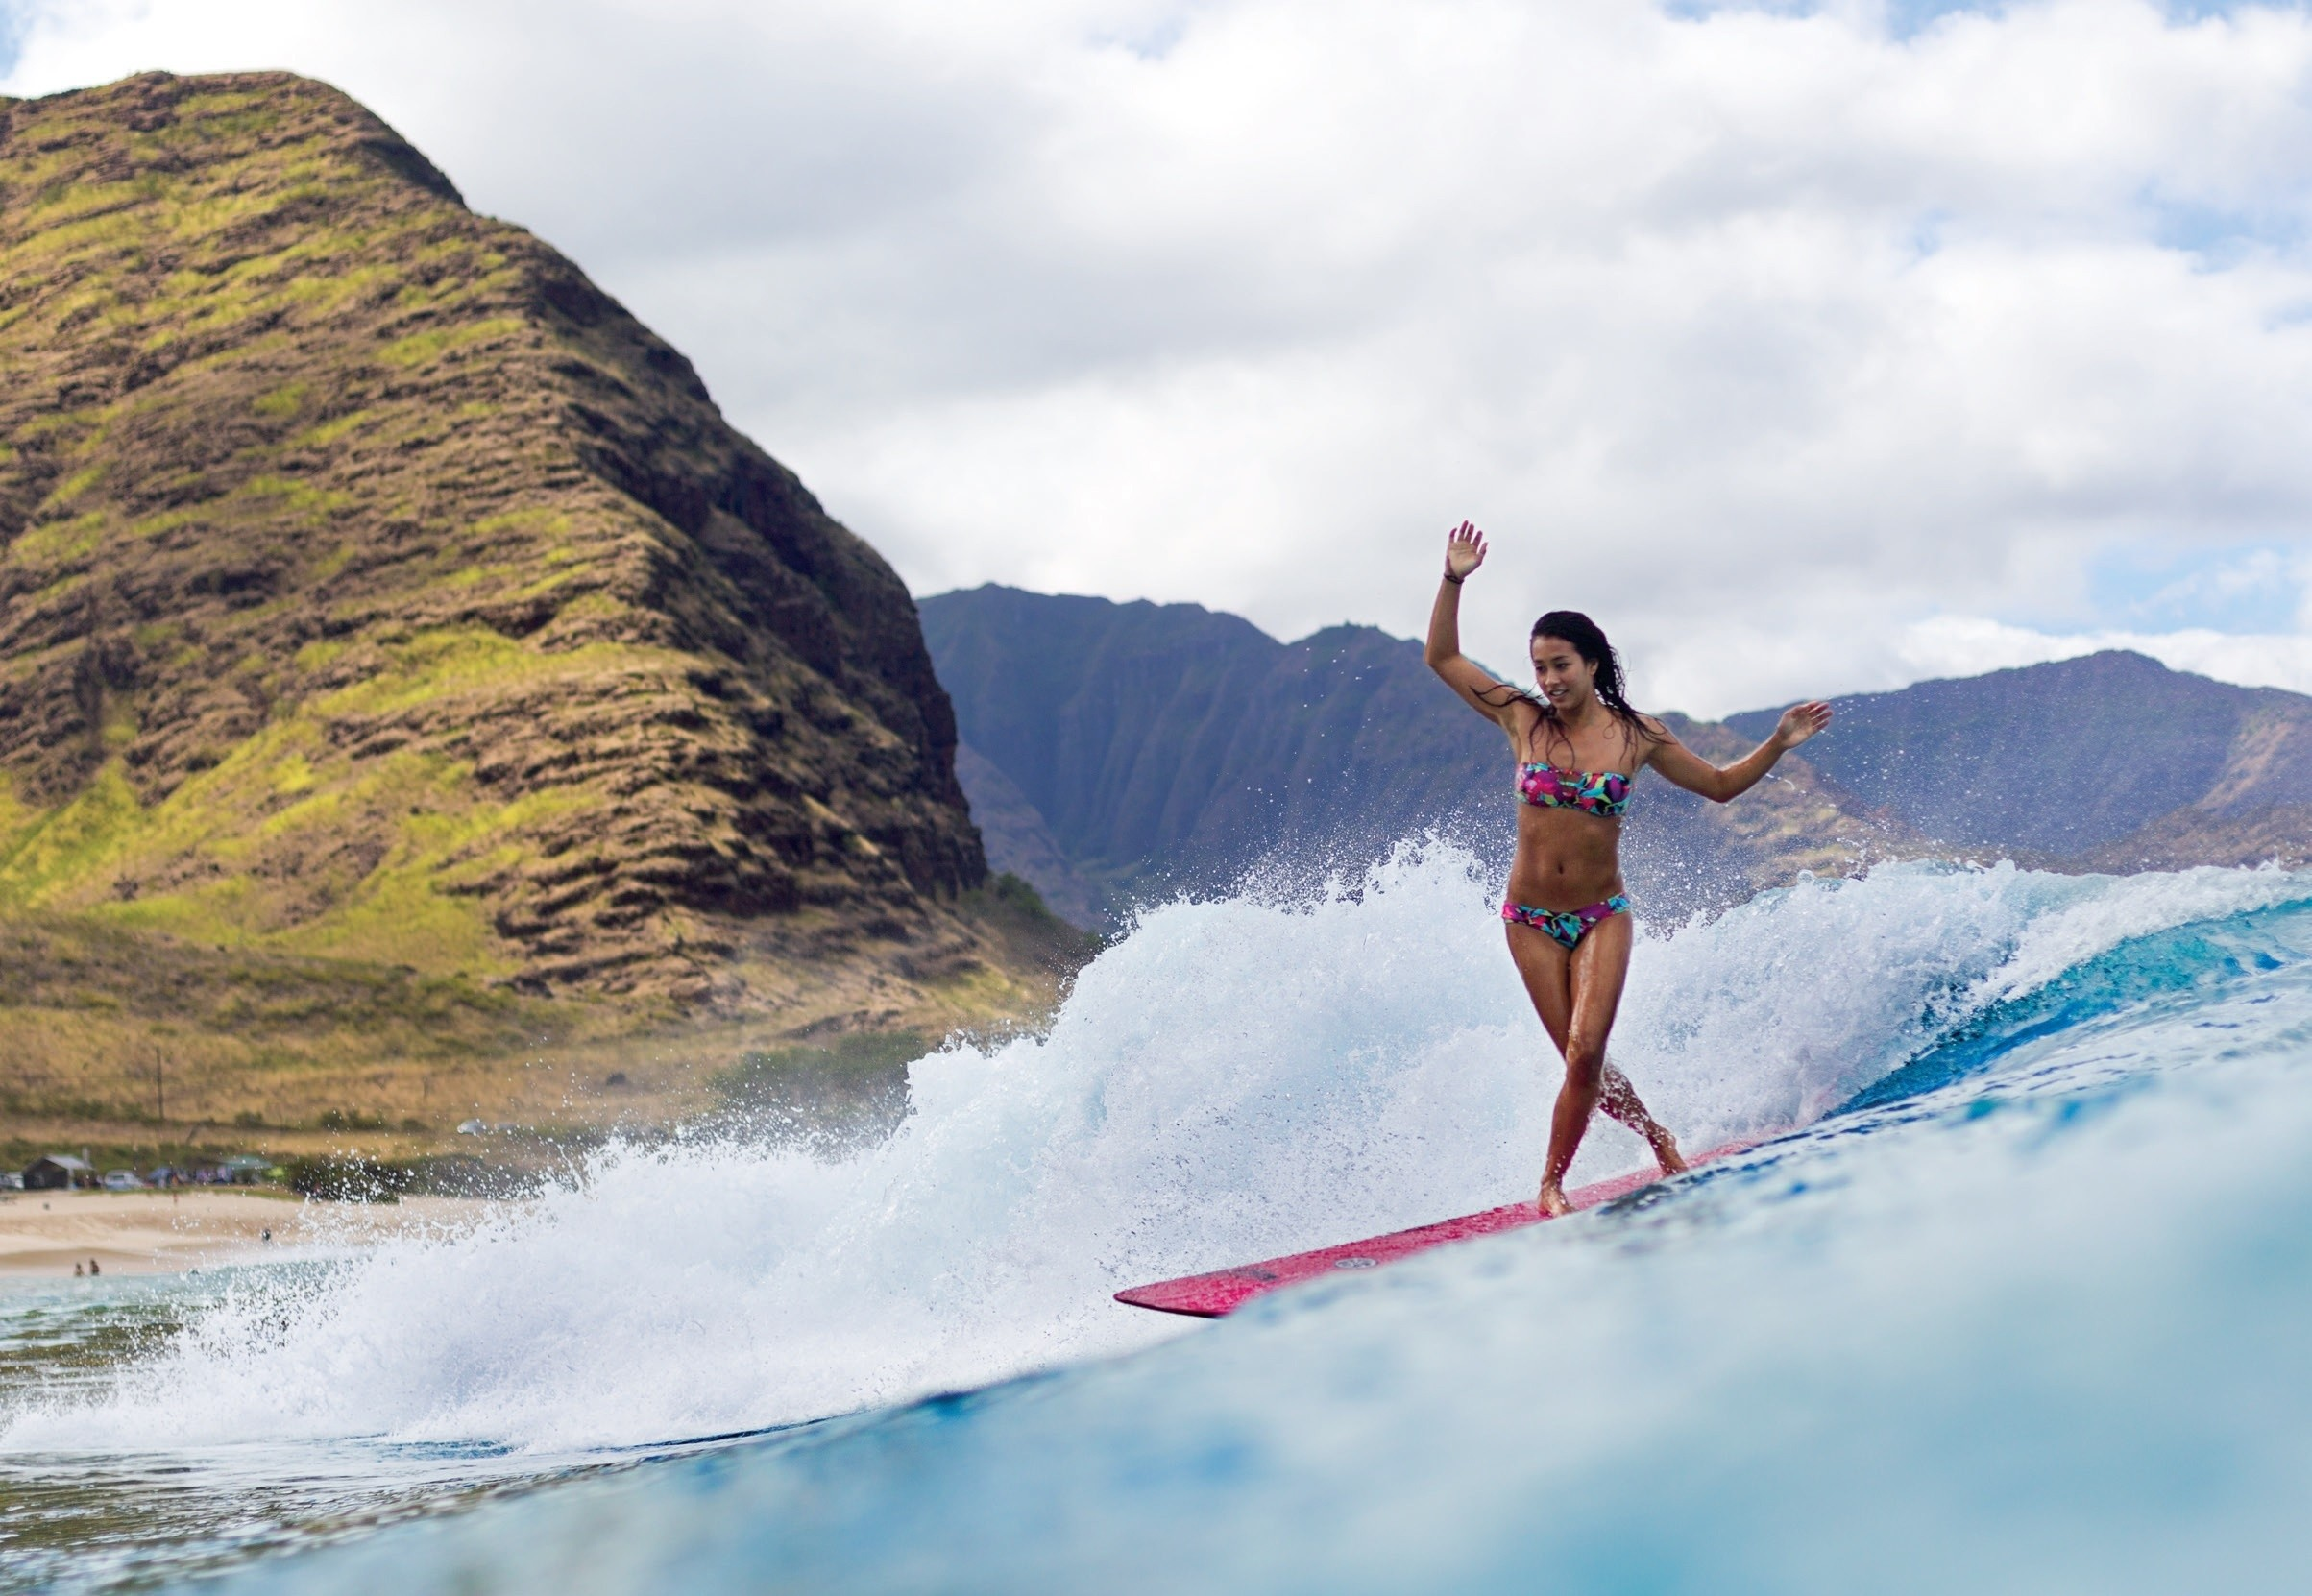 Res: 2407x1662, Surfer Girl - Oceans & Nature Background Wallpapers on Desktop .